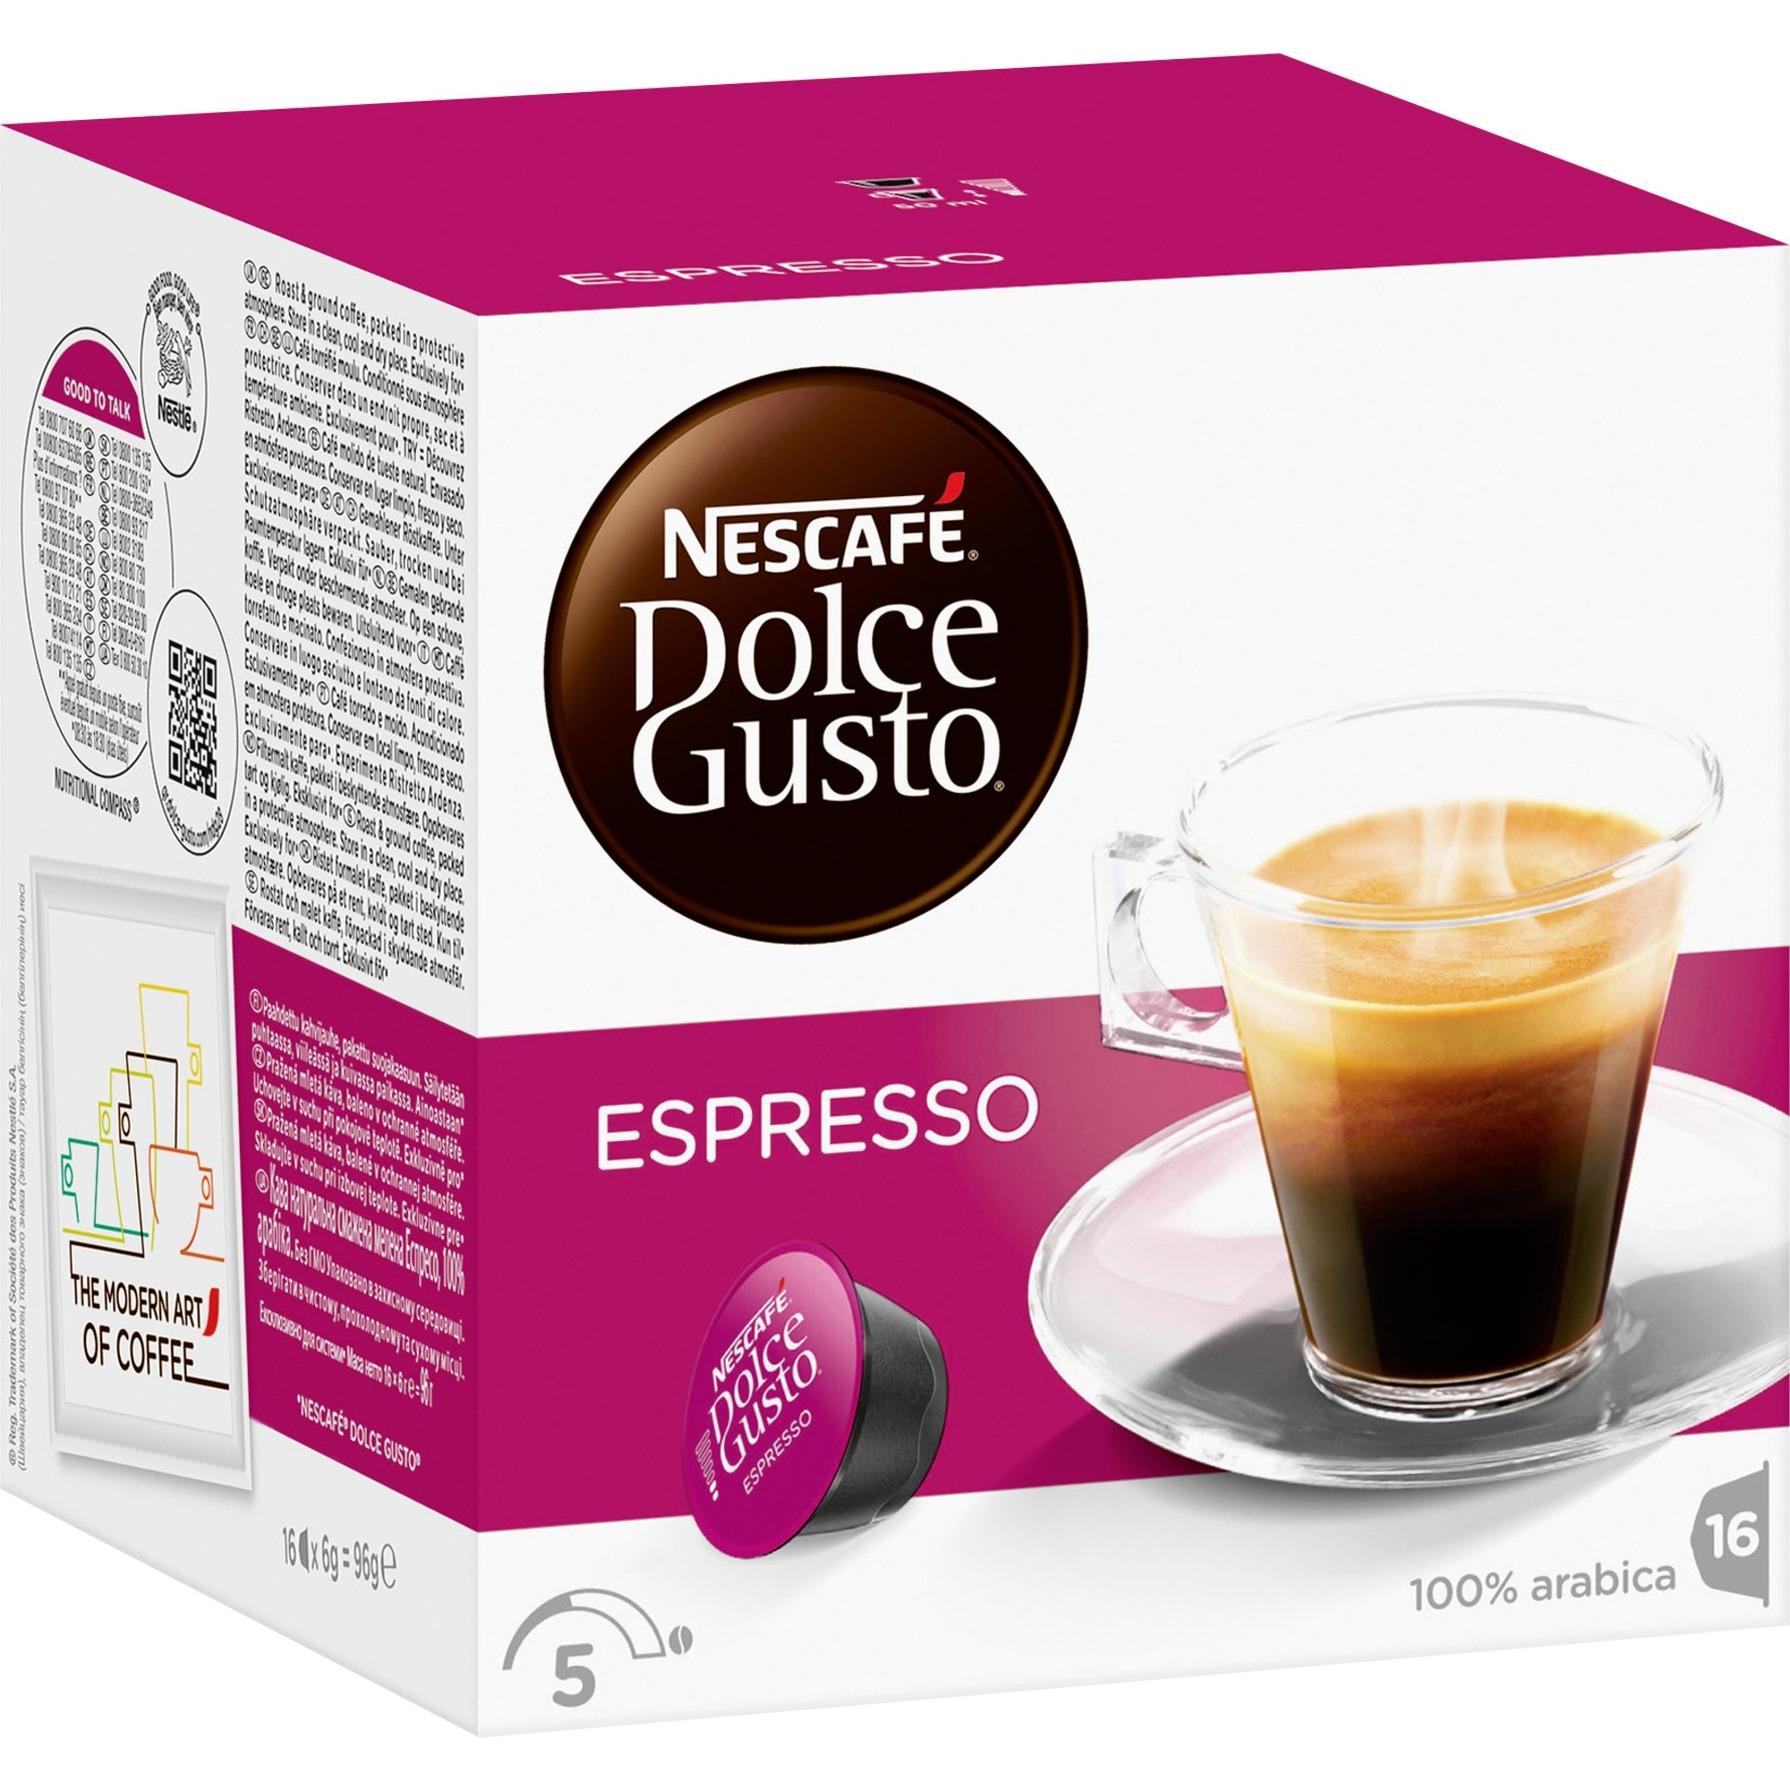 Dolce Gusto Espresso café instantáneo, Cápsula de bebida